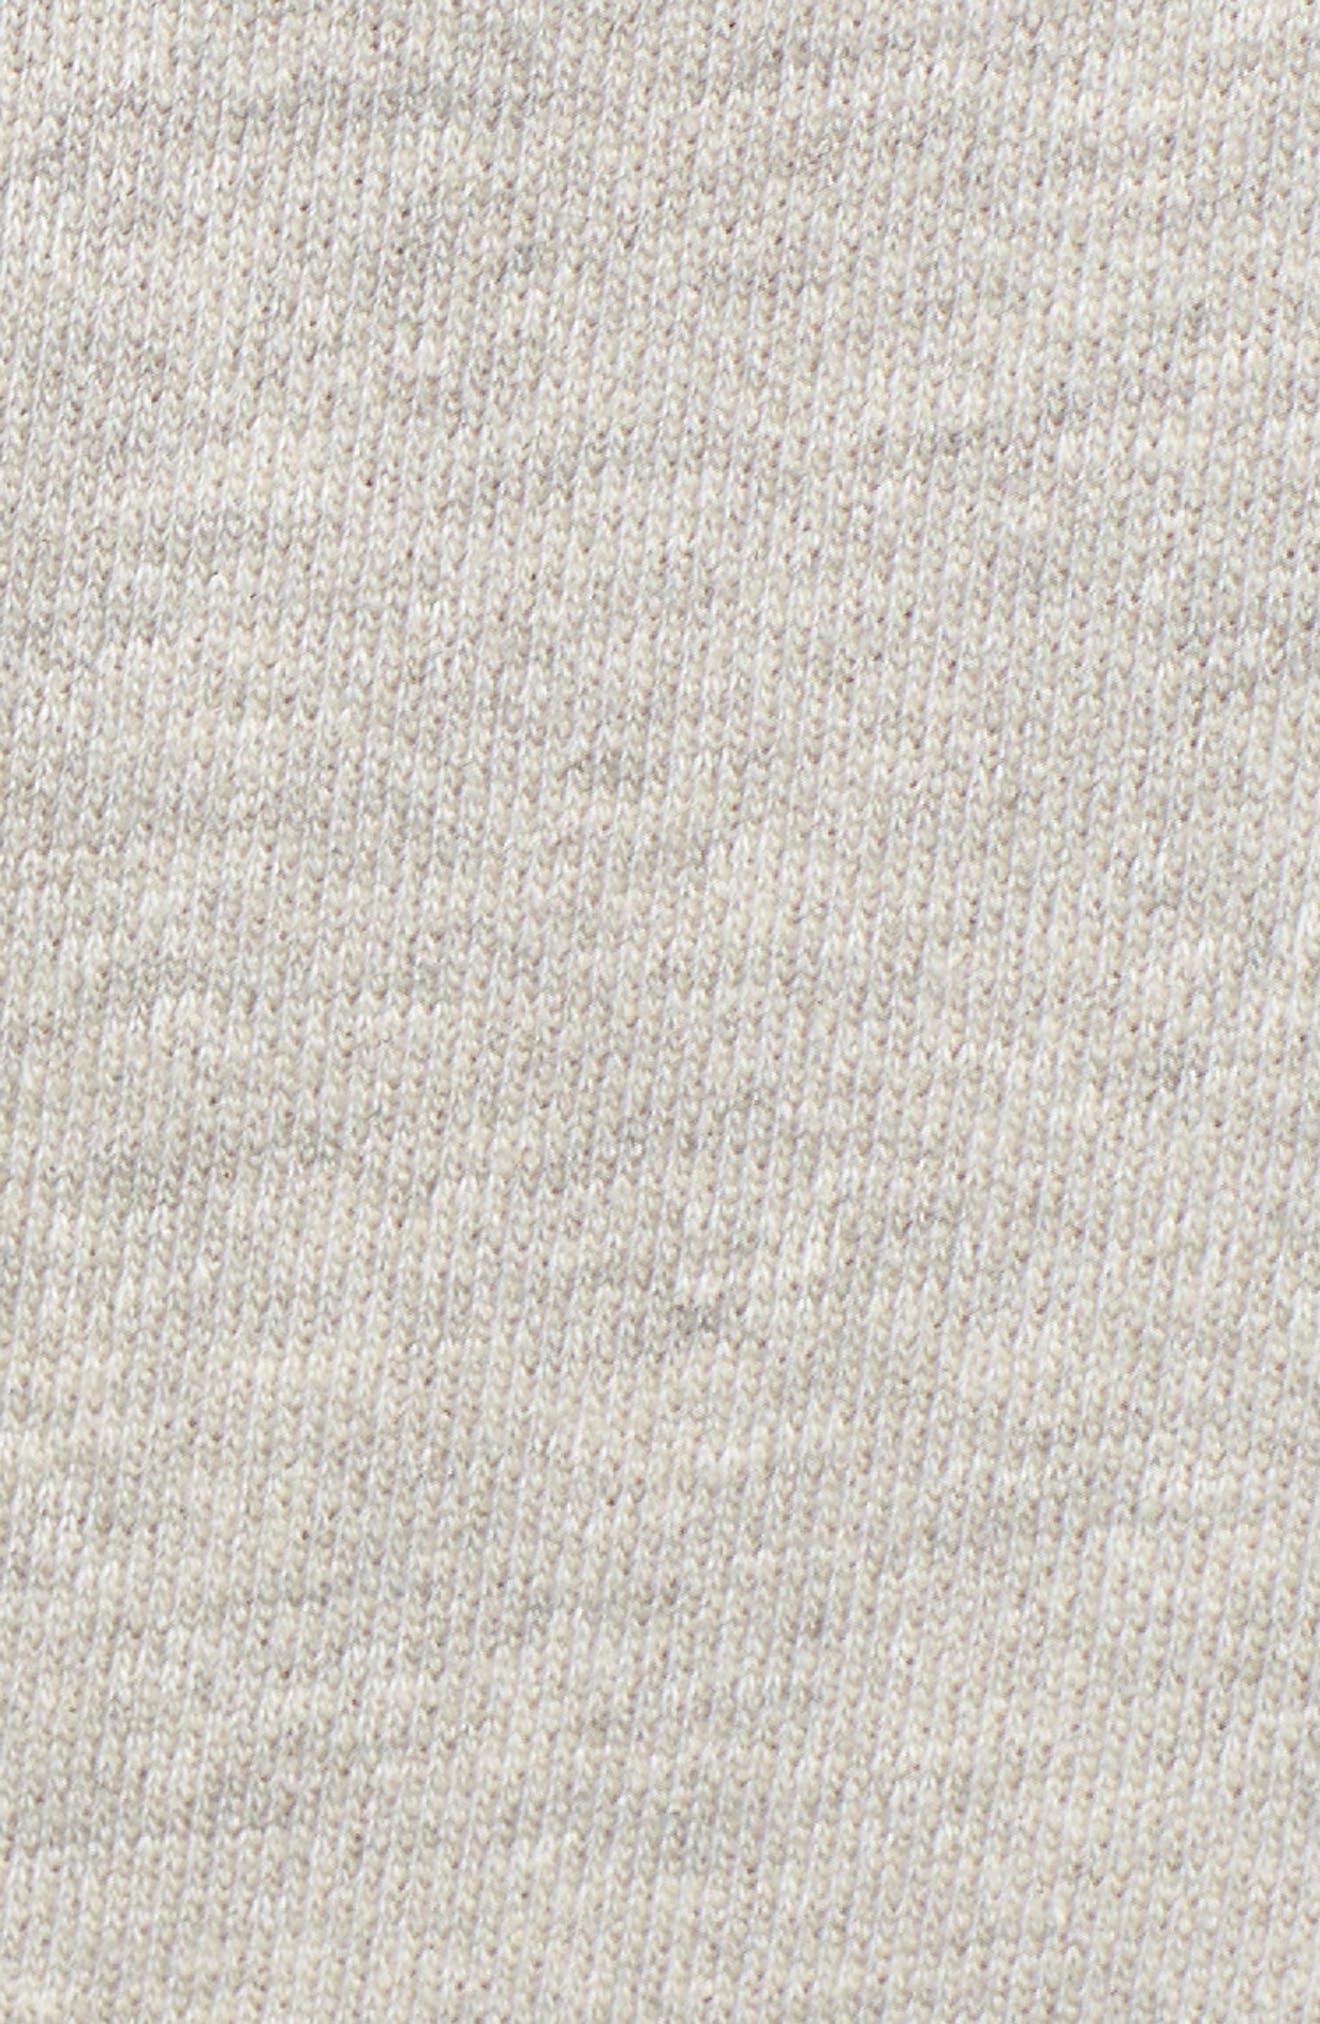 Off-Duty Cotton Knit Drawstring Skirt,                             Alternate thumbnail 4, color,                             Grey Heather